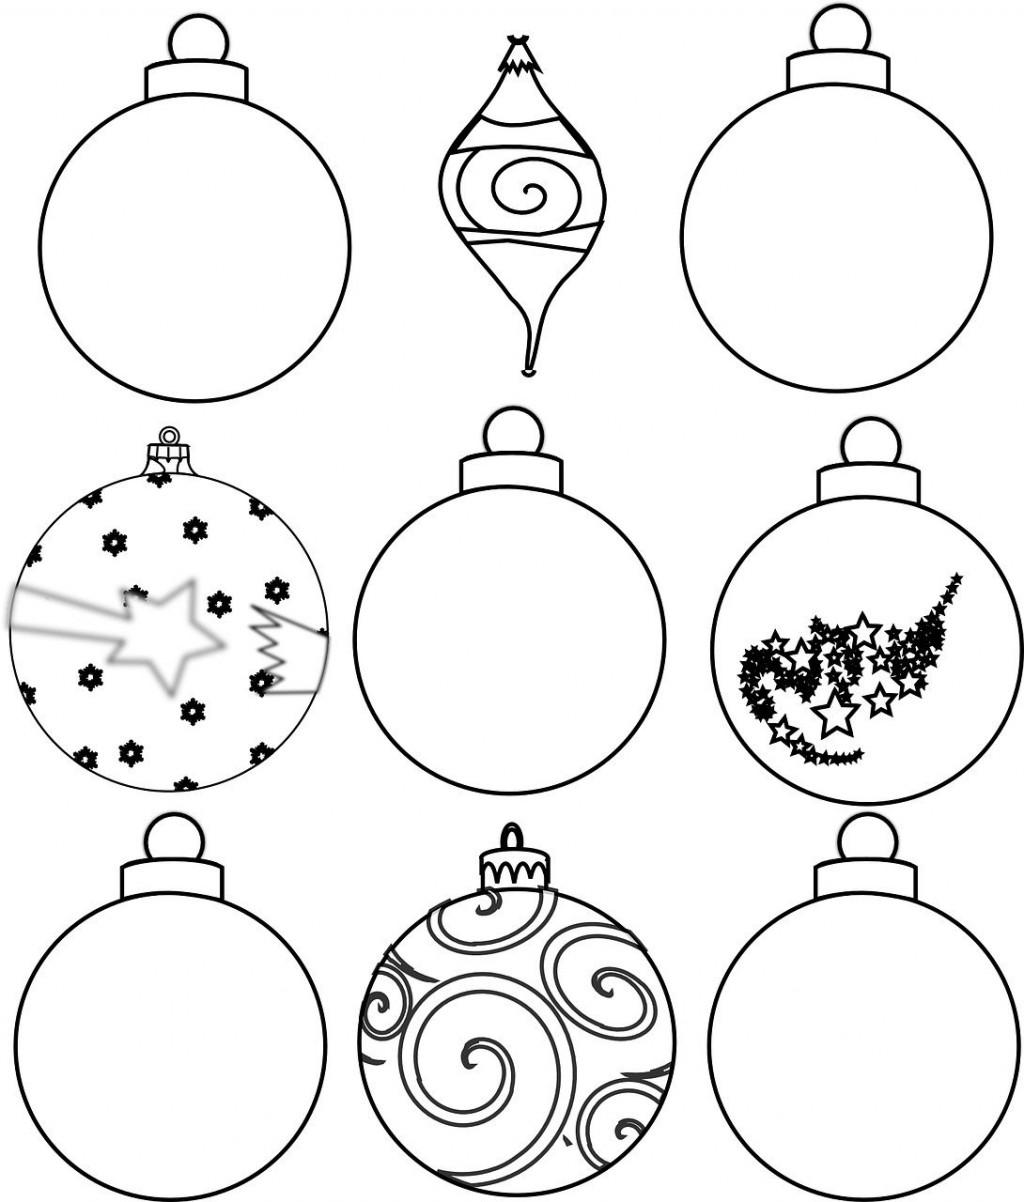 002 Excellent Printable Christma Ornament Template Sample  Templates Stencil Felt Pattern TreeLarge